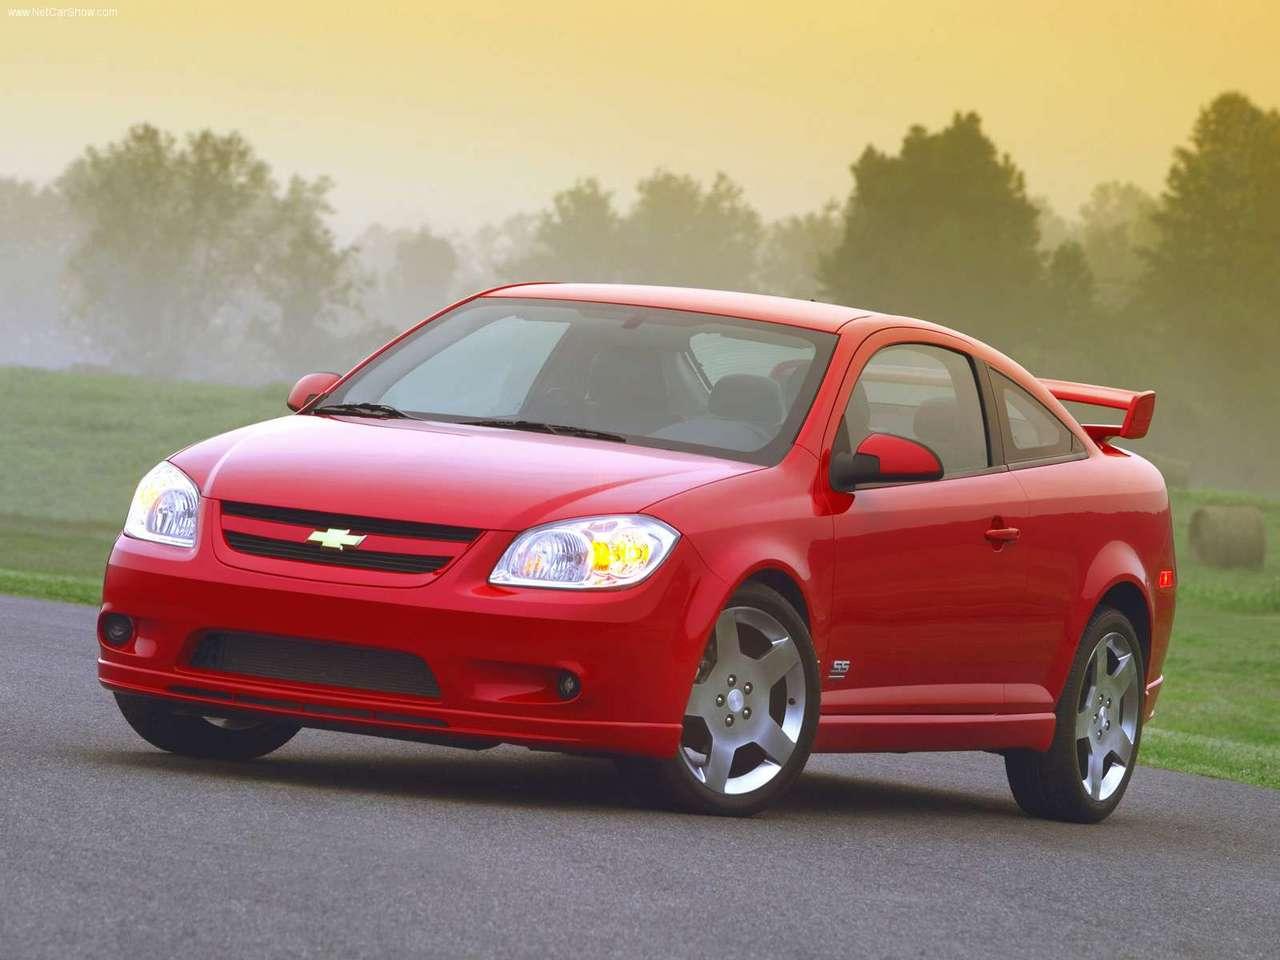 ... - Populaire français d'automobiles: 2006 Chevrolet Cobalt SS